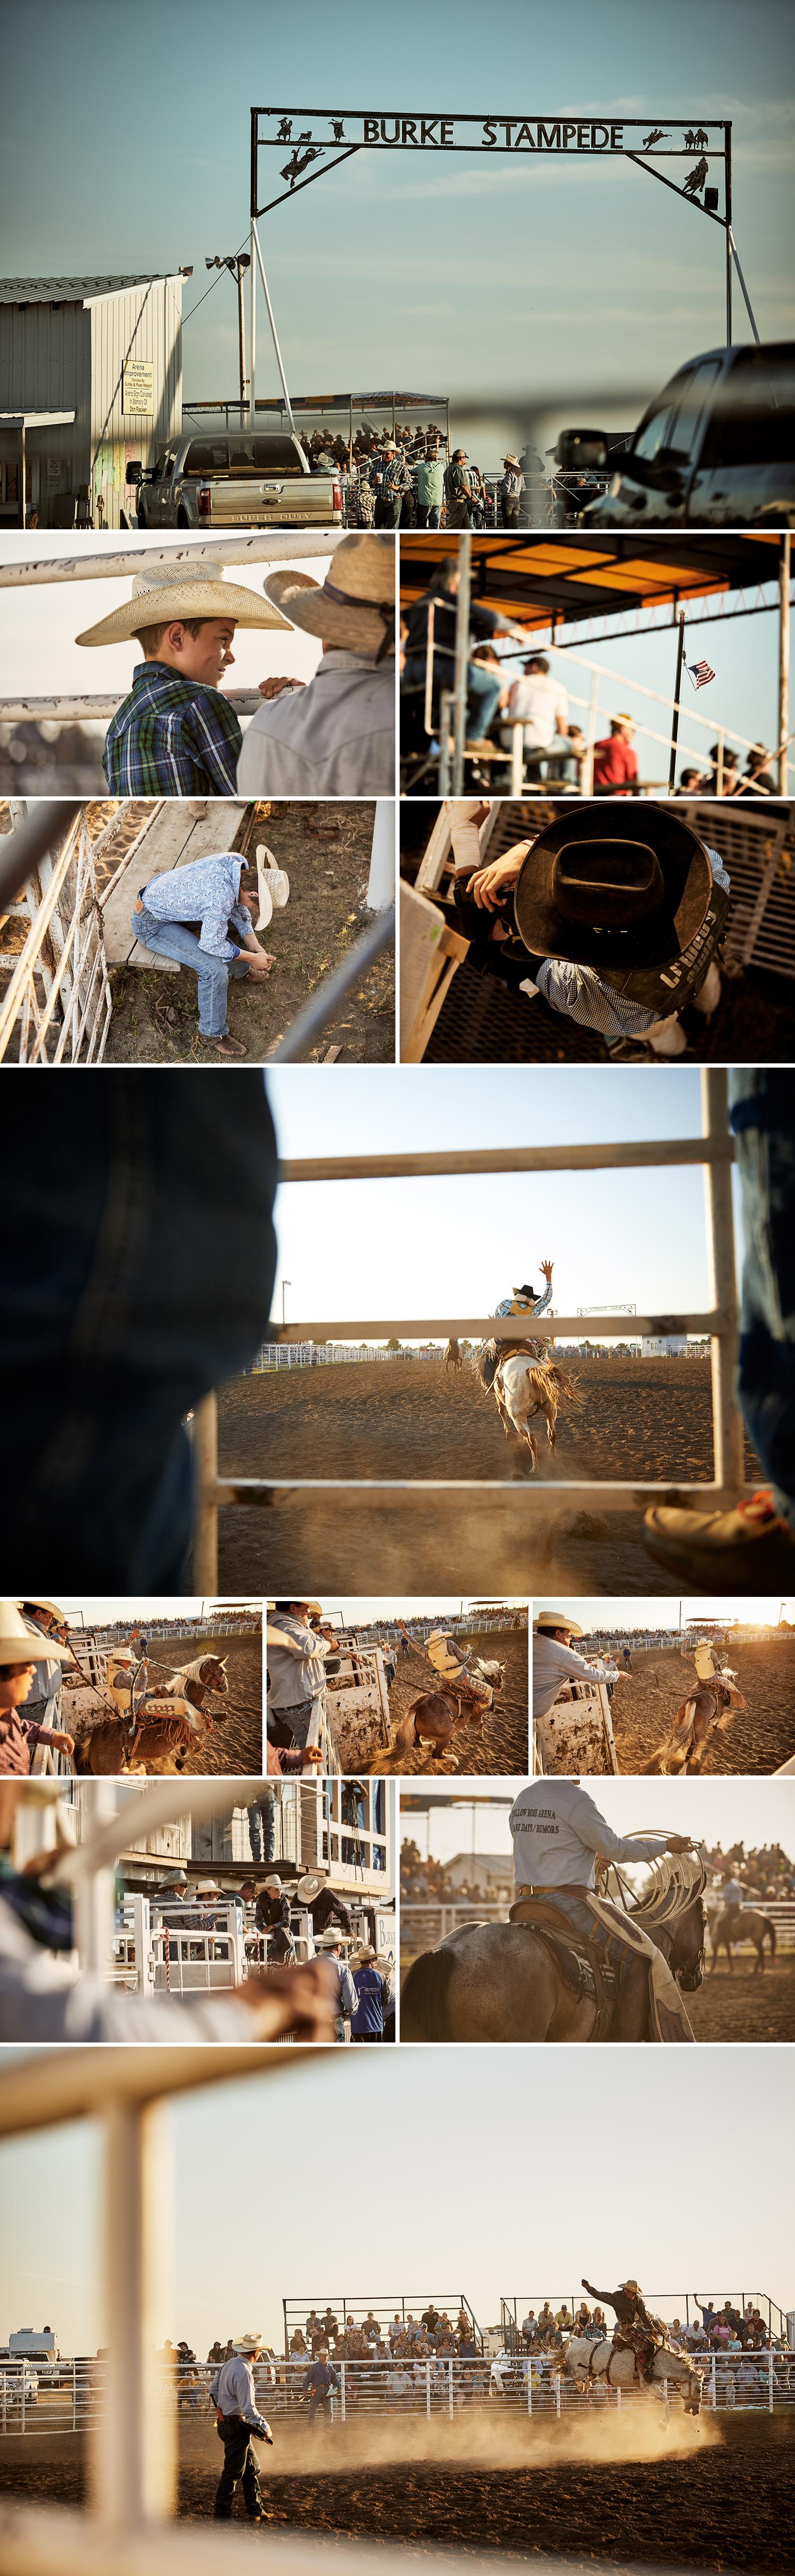 rodeo_Blog.jpg